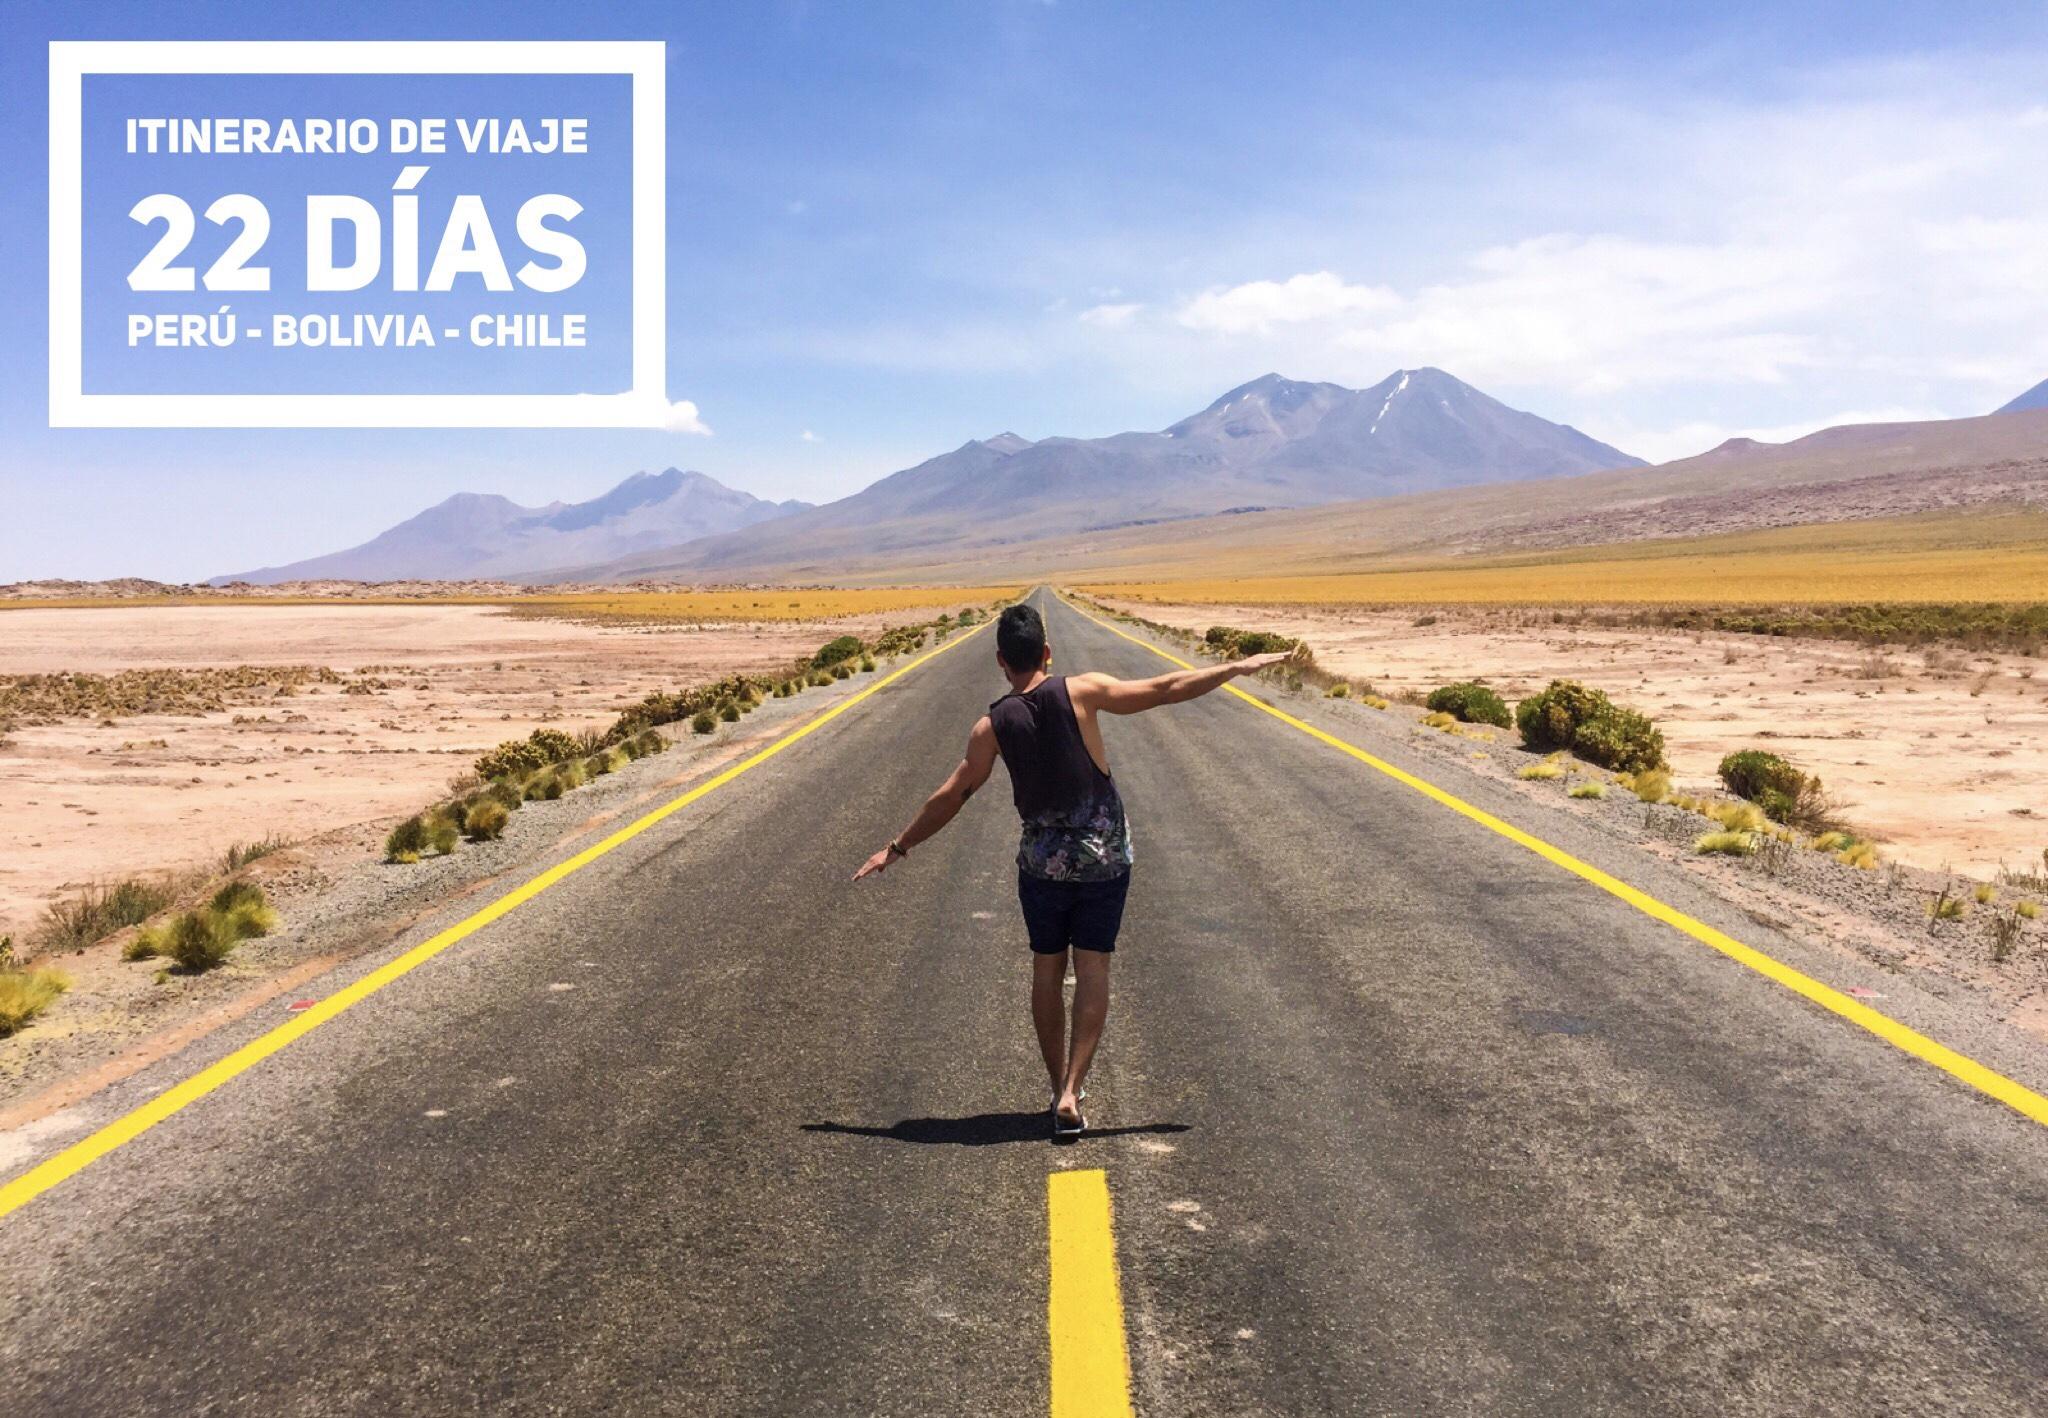 ITINERARIO DE VIAJE POR PERÚ - BOLIVIA - CHILE